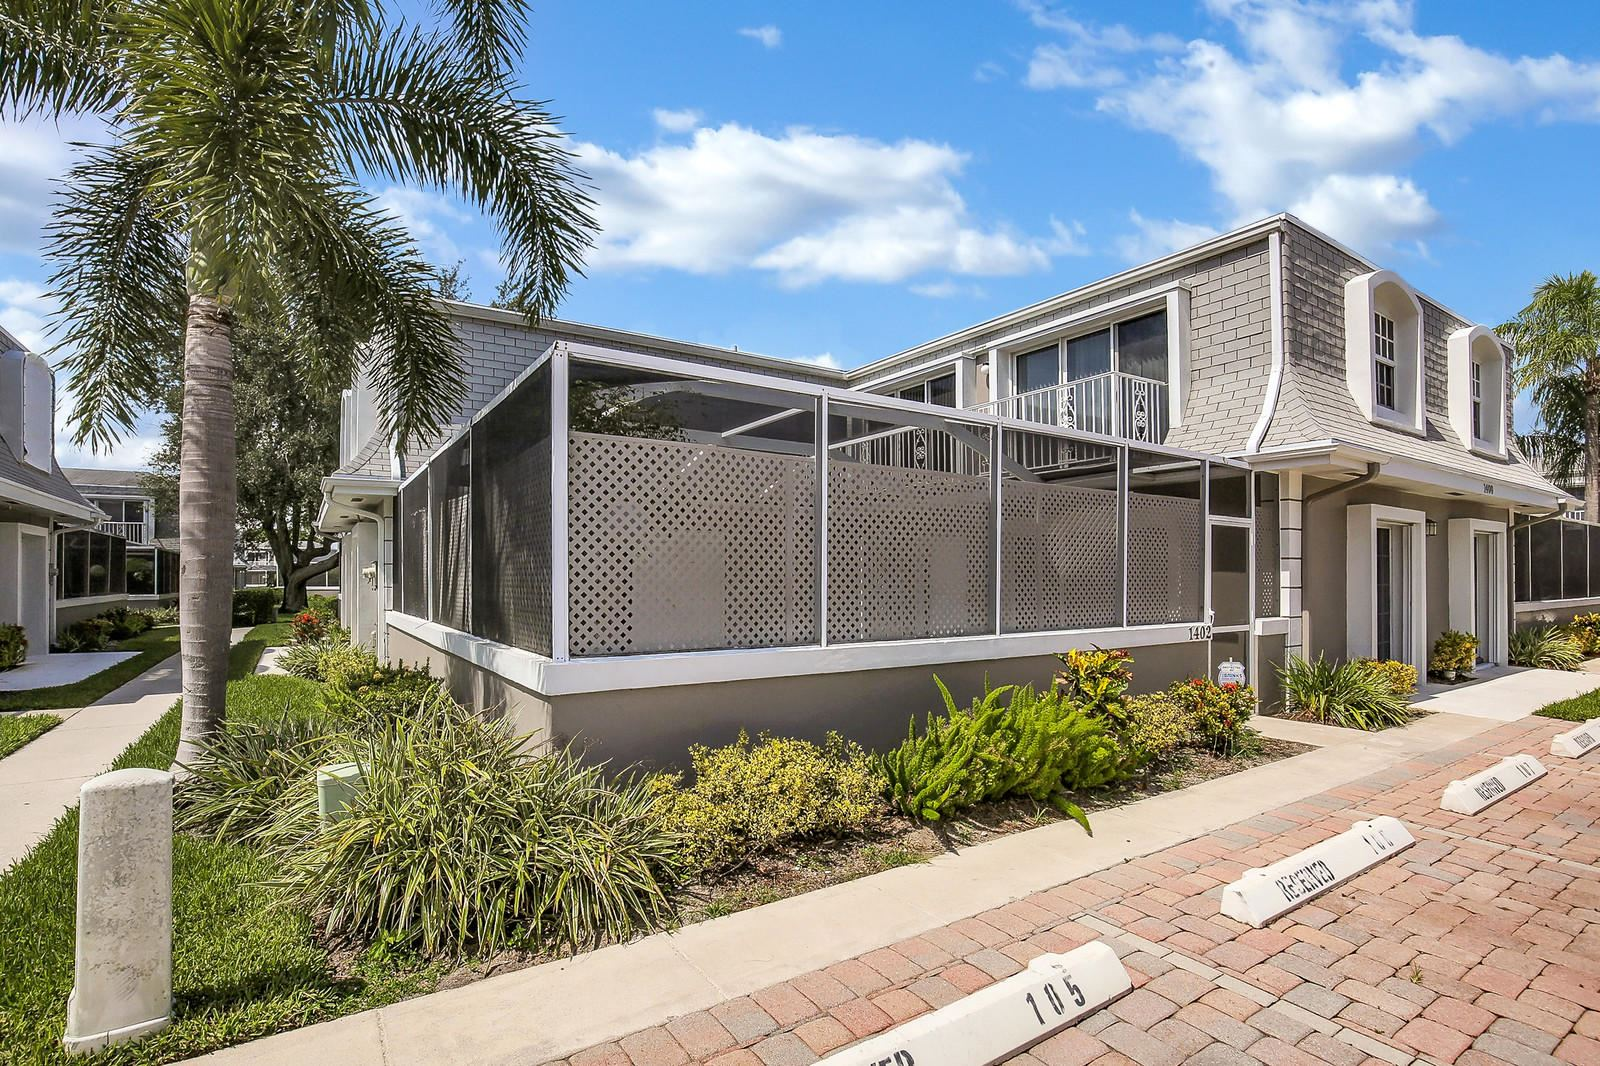 Photo of 1402 Vision Drive, Palm Beach Gardens, FL 33418 (MLS # RX-10685156)